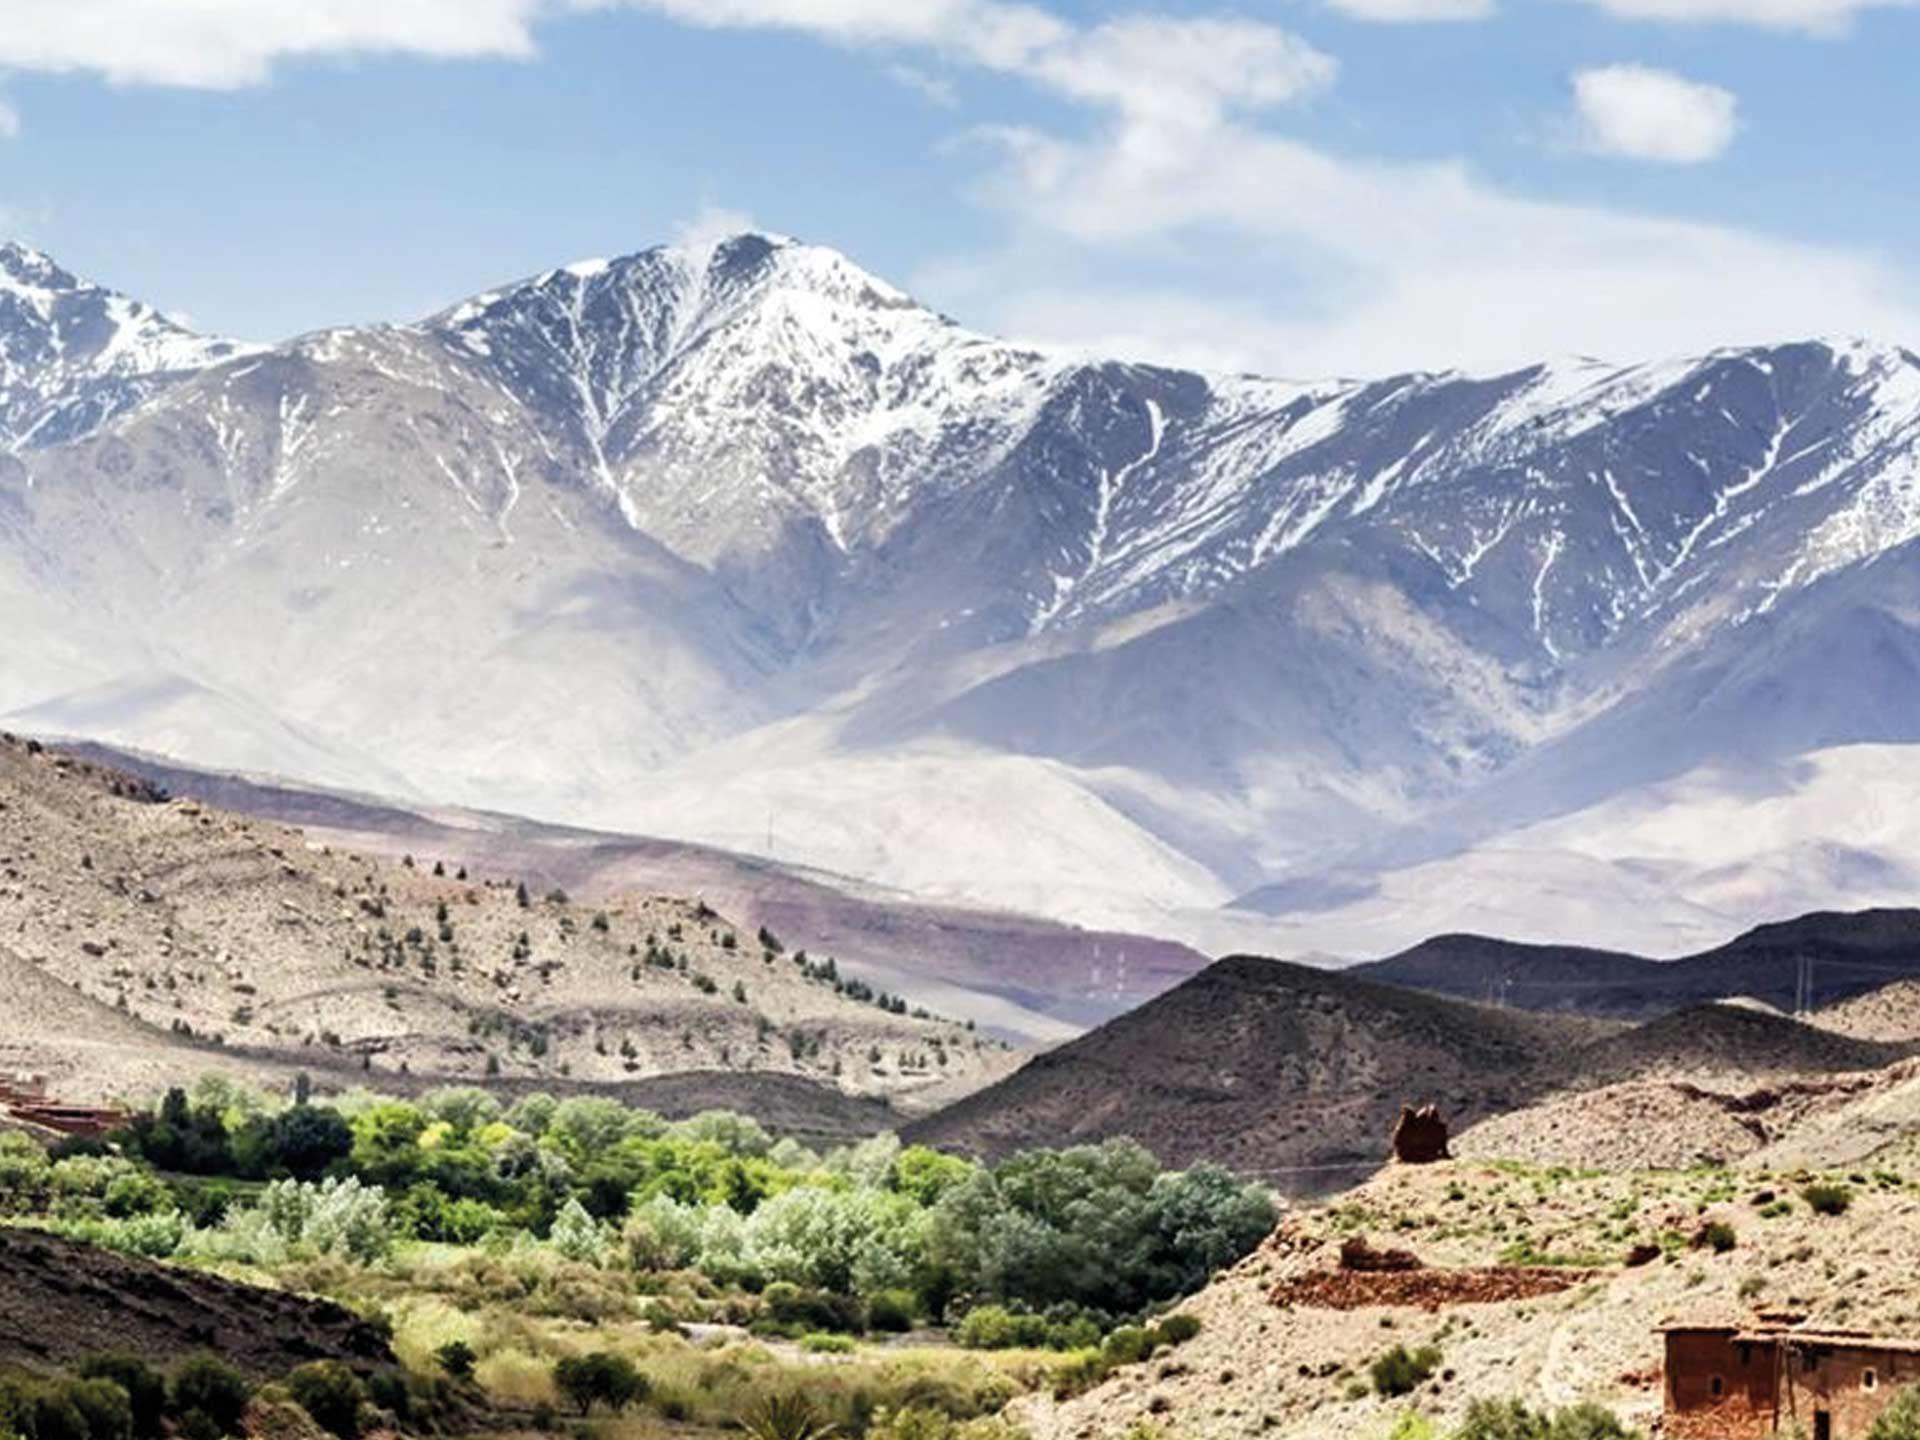 Moroccan Family Ourika Valley & Atlas Mountains Morocco Tours & Excursions